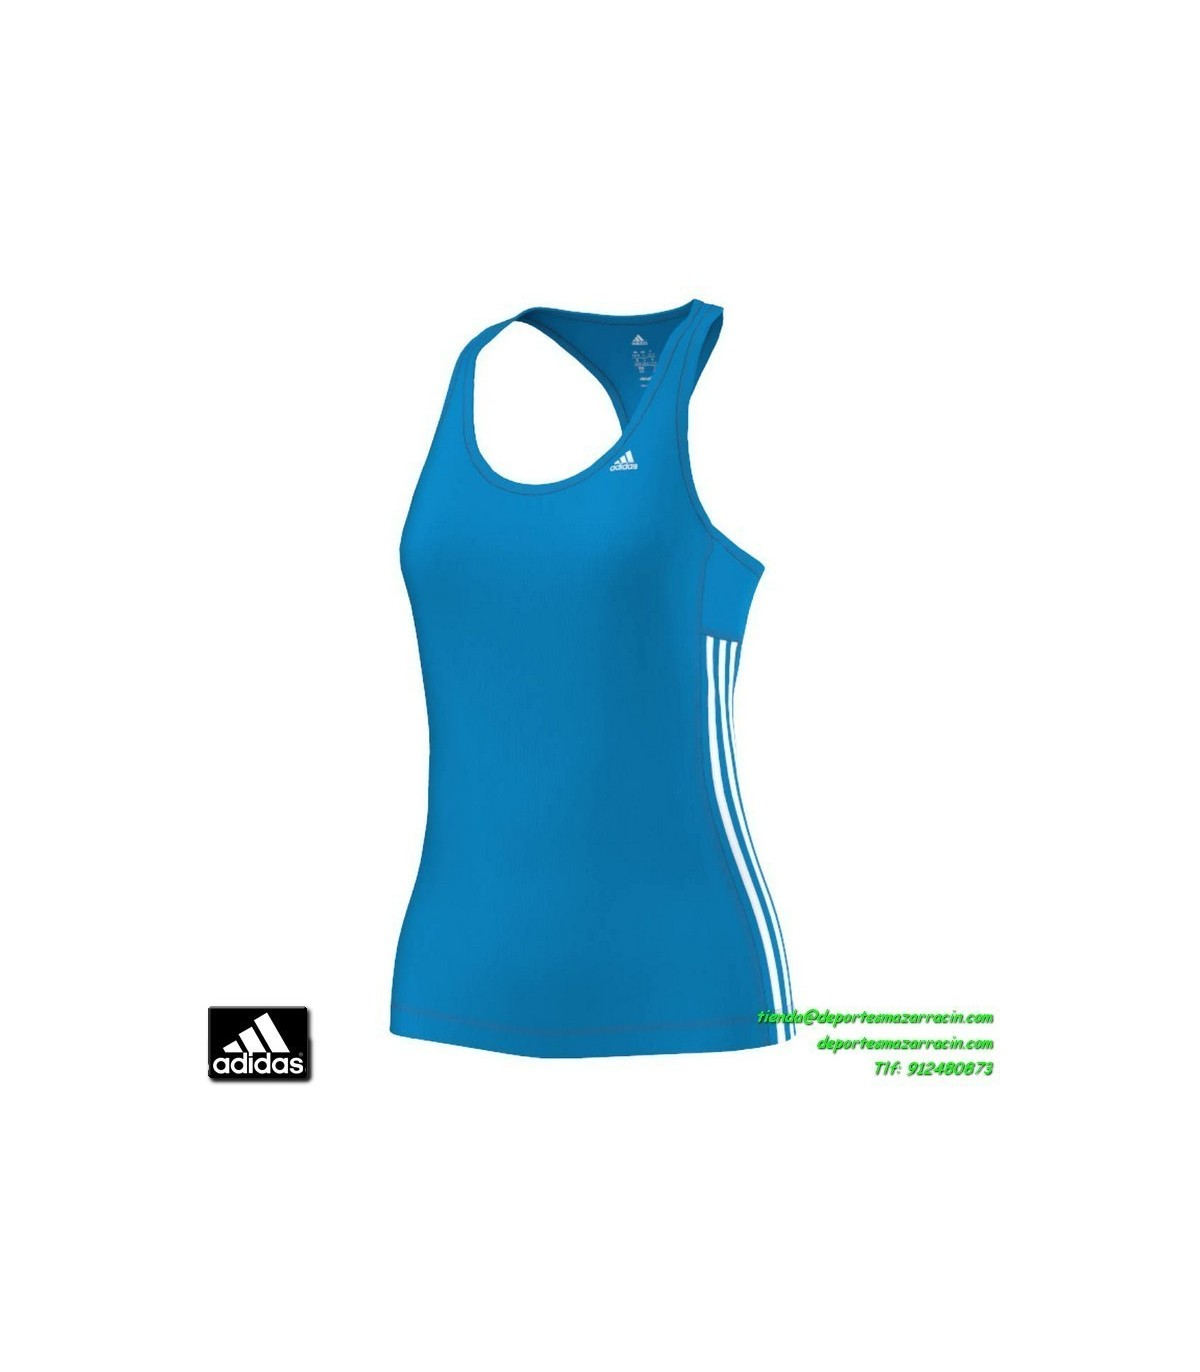 3502ab90c ADIDAS camiseta tirantes deporte mujer AZUL TRANSPIRABLE